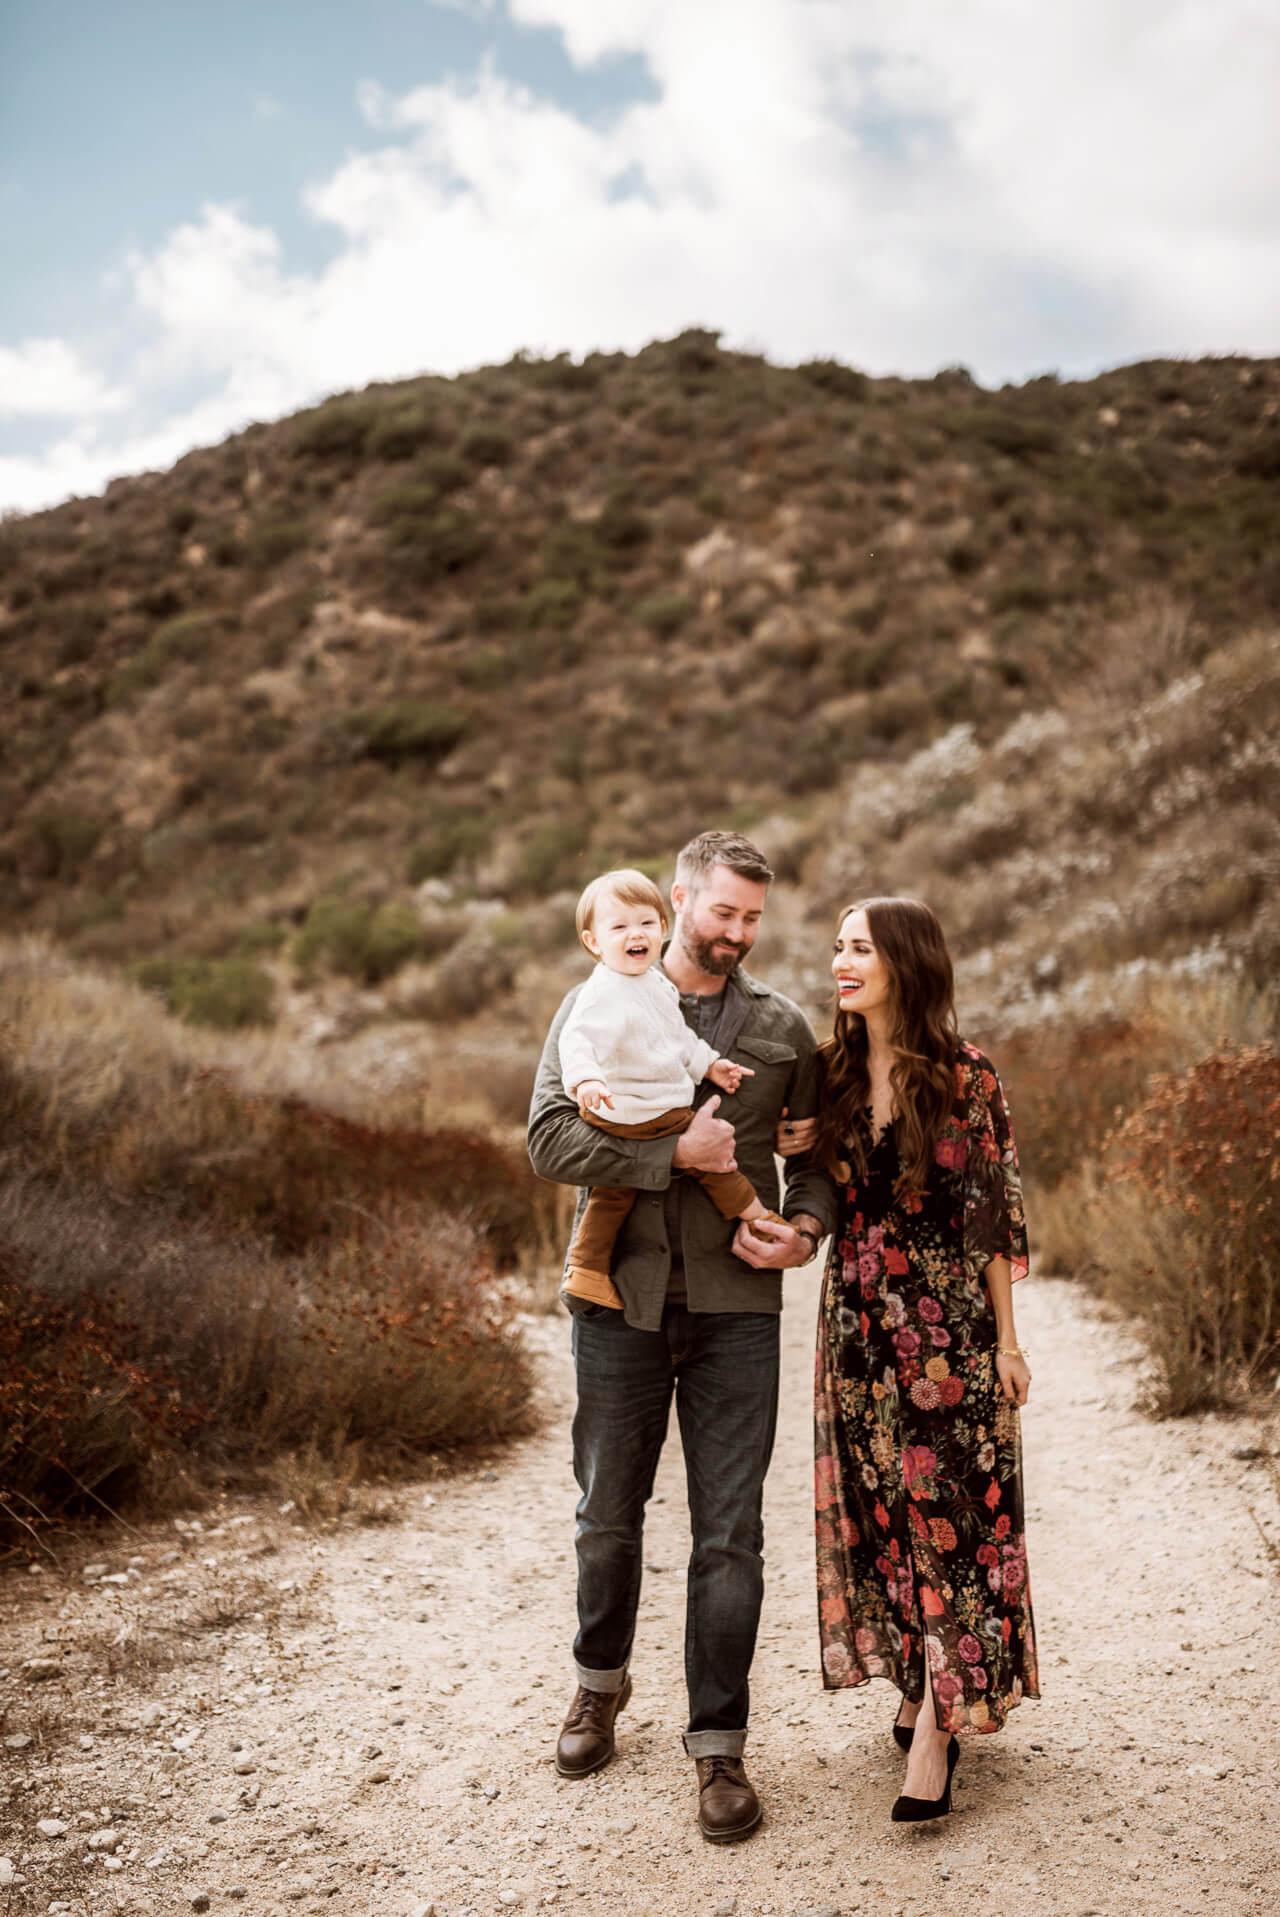 M Loves M family Christmas photos 2017 - @marmar